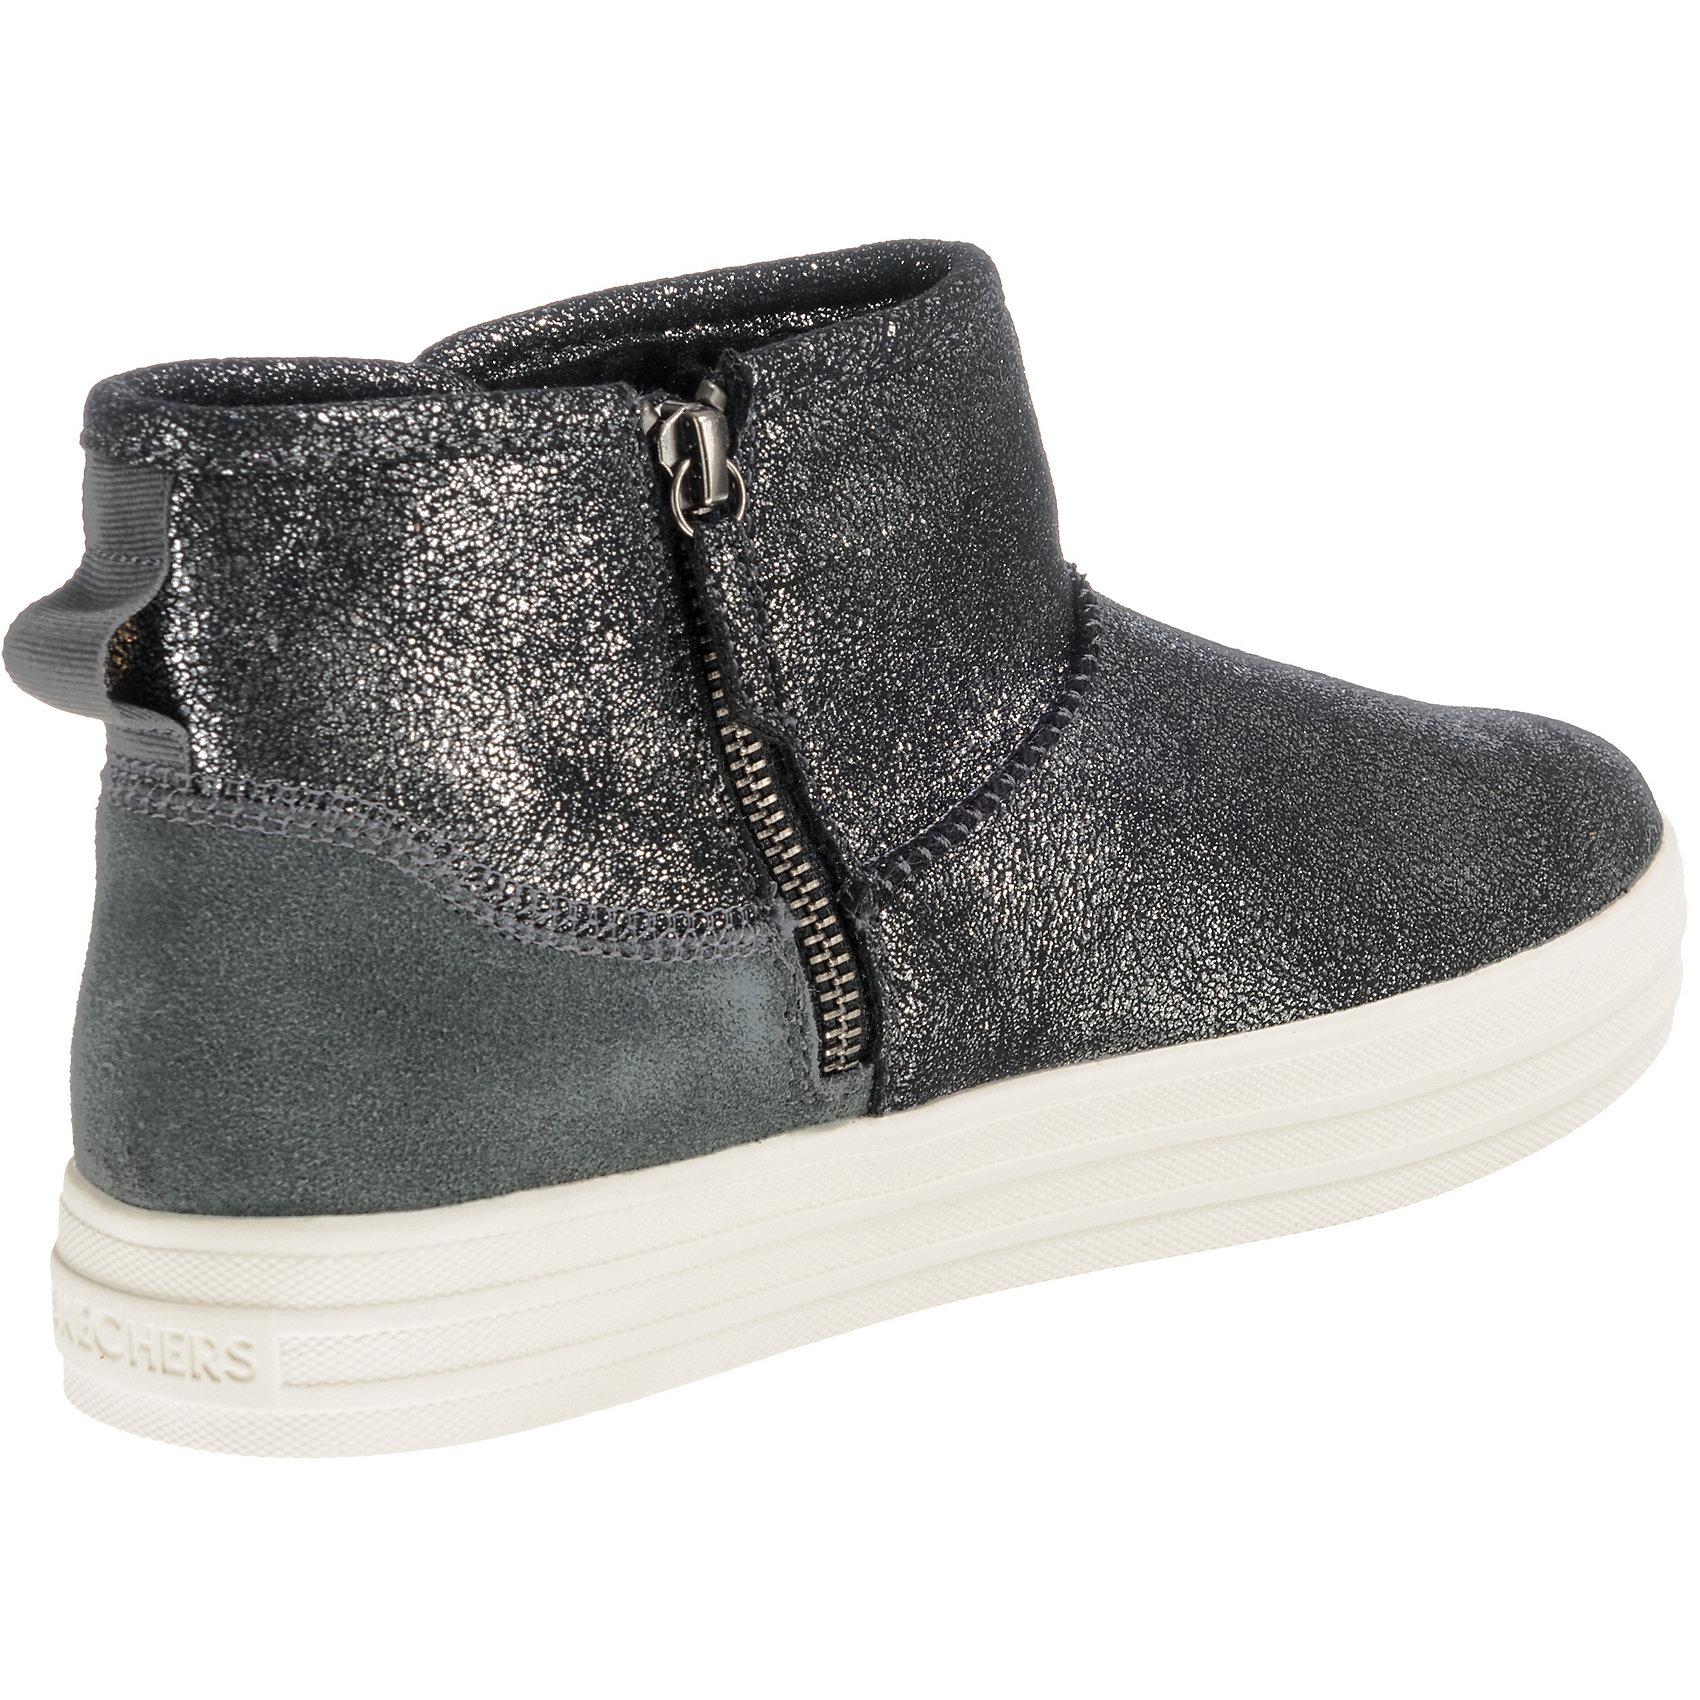 Neu SKECHERS Damen DOUBLE UPWARM SHINE Sneakers High 8666237 für Damen SKECHERS grau bbdfb6